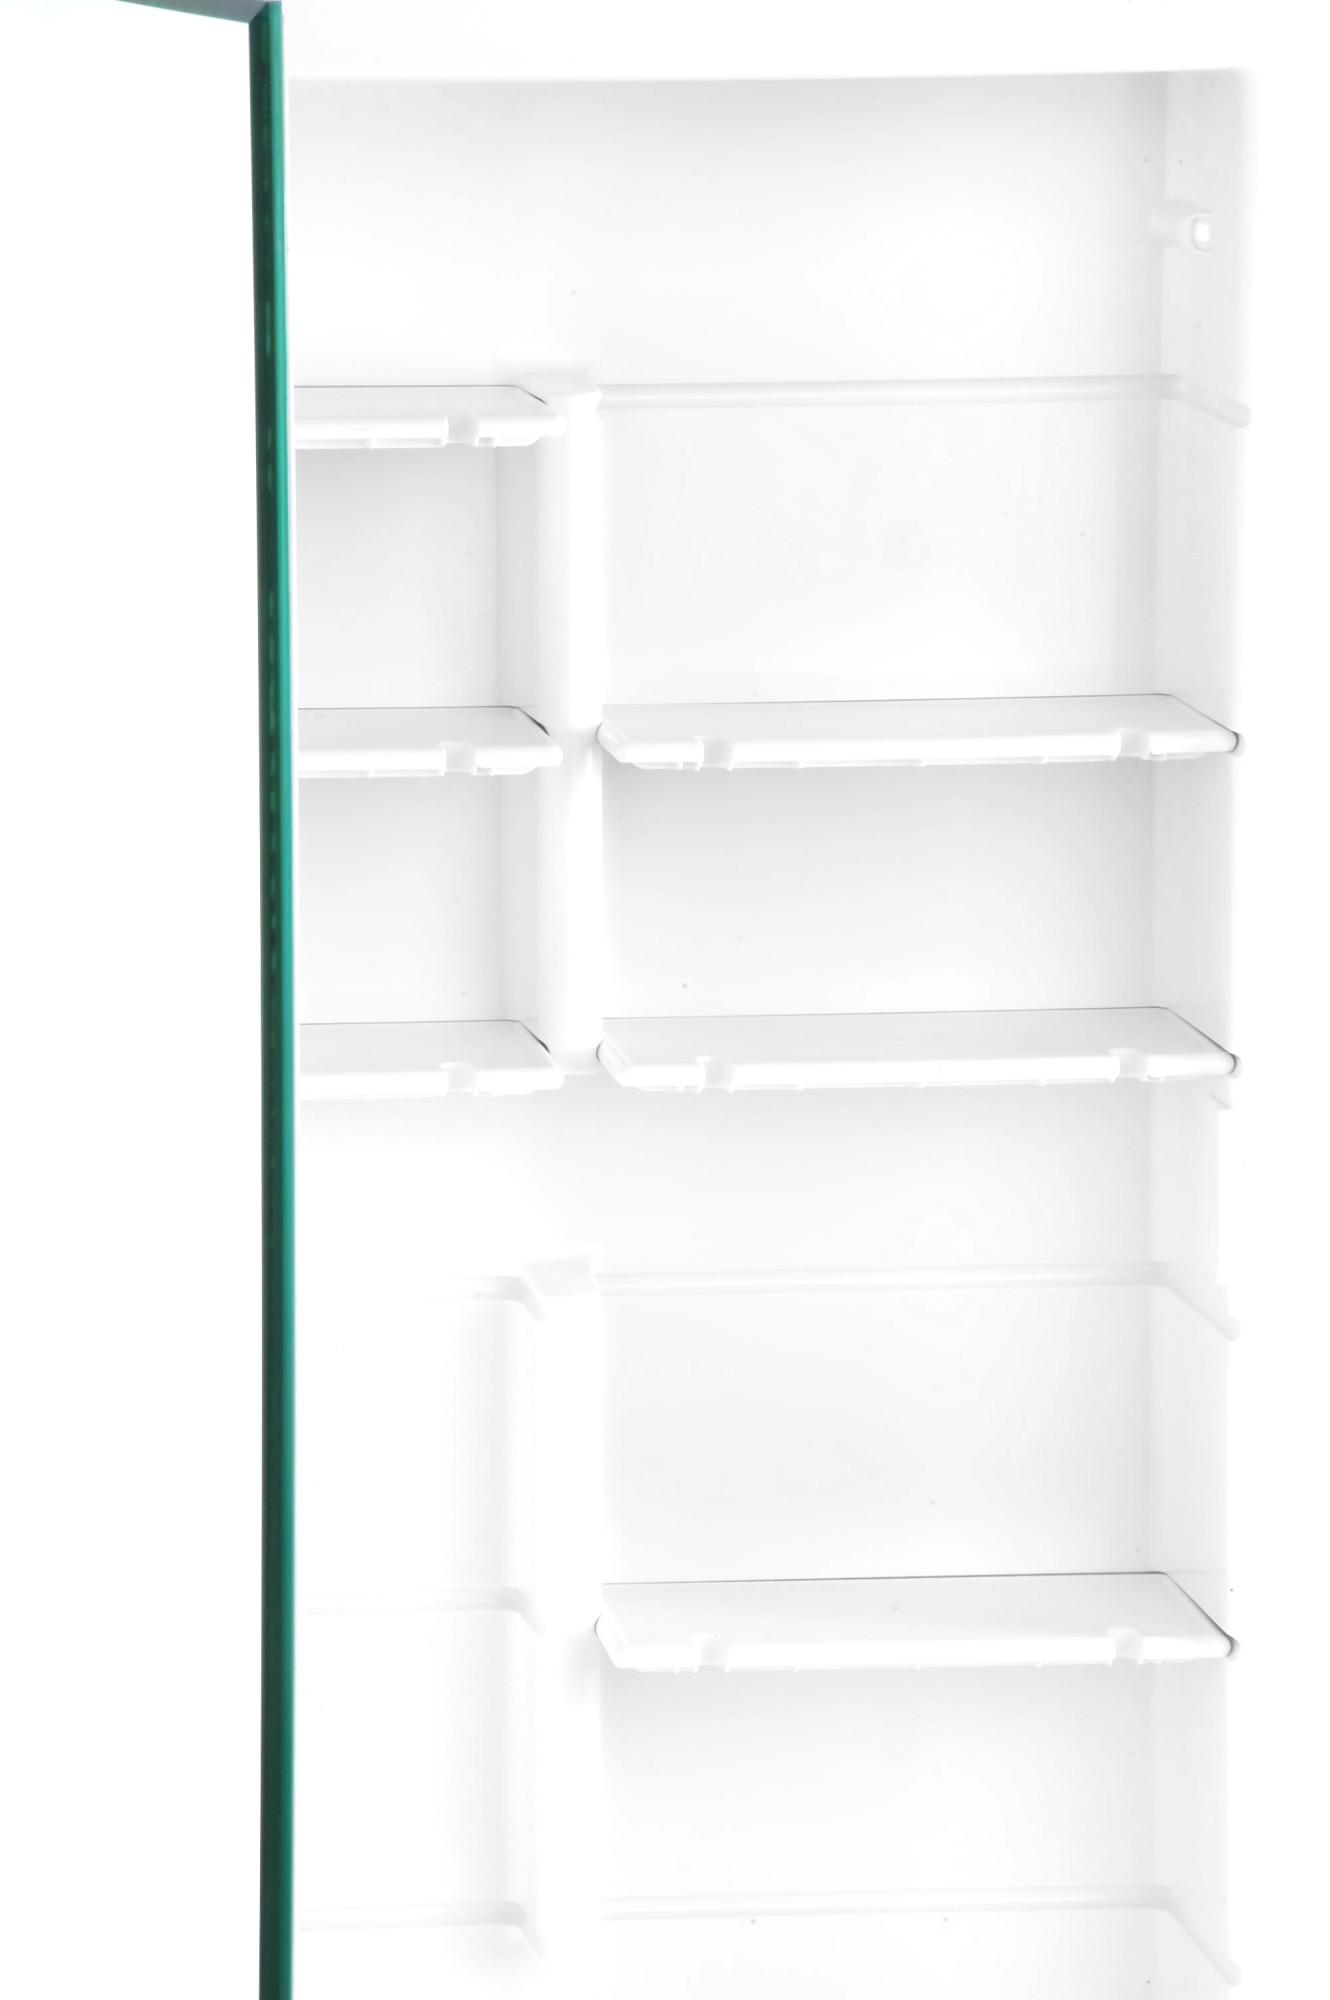 Zaca 21 2 36 Media 36 Quot Polished Edge Medicine Cabinet Ebay